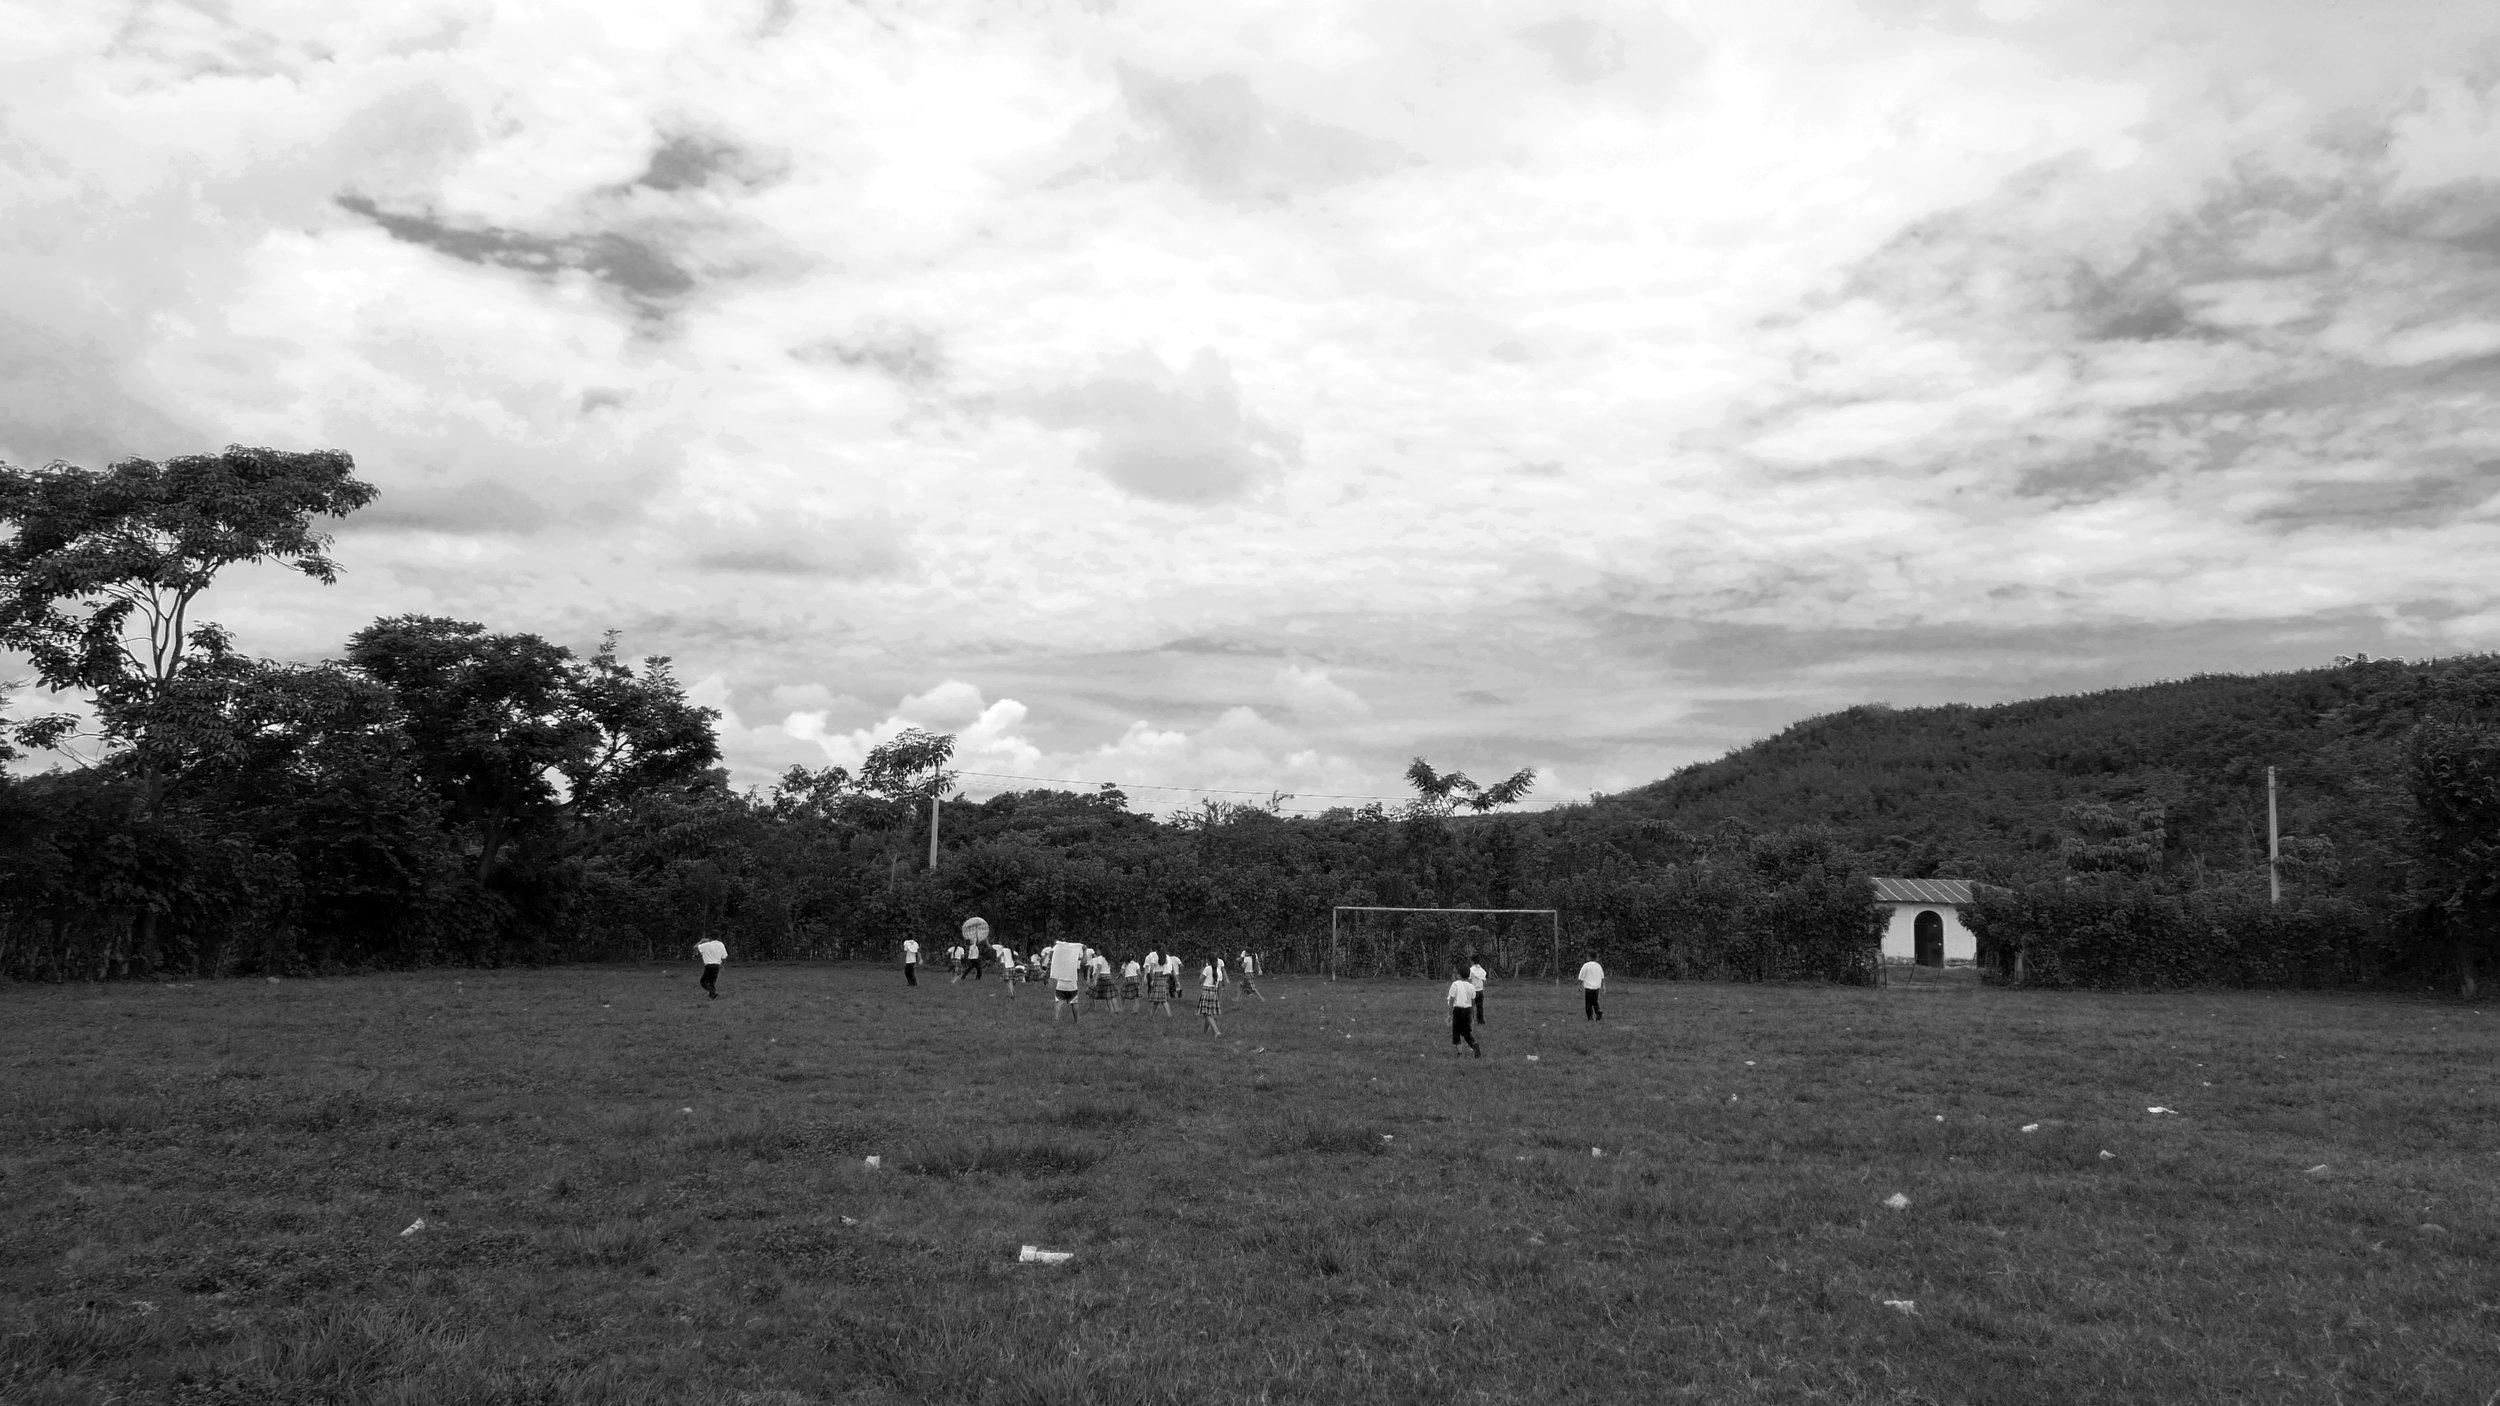 GUATEMALA - SUMMER 2017